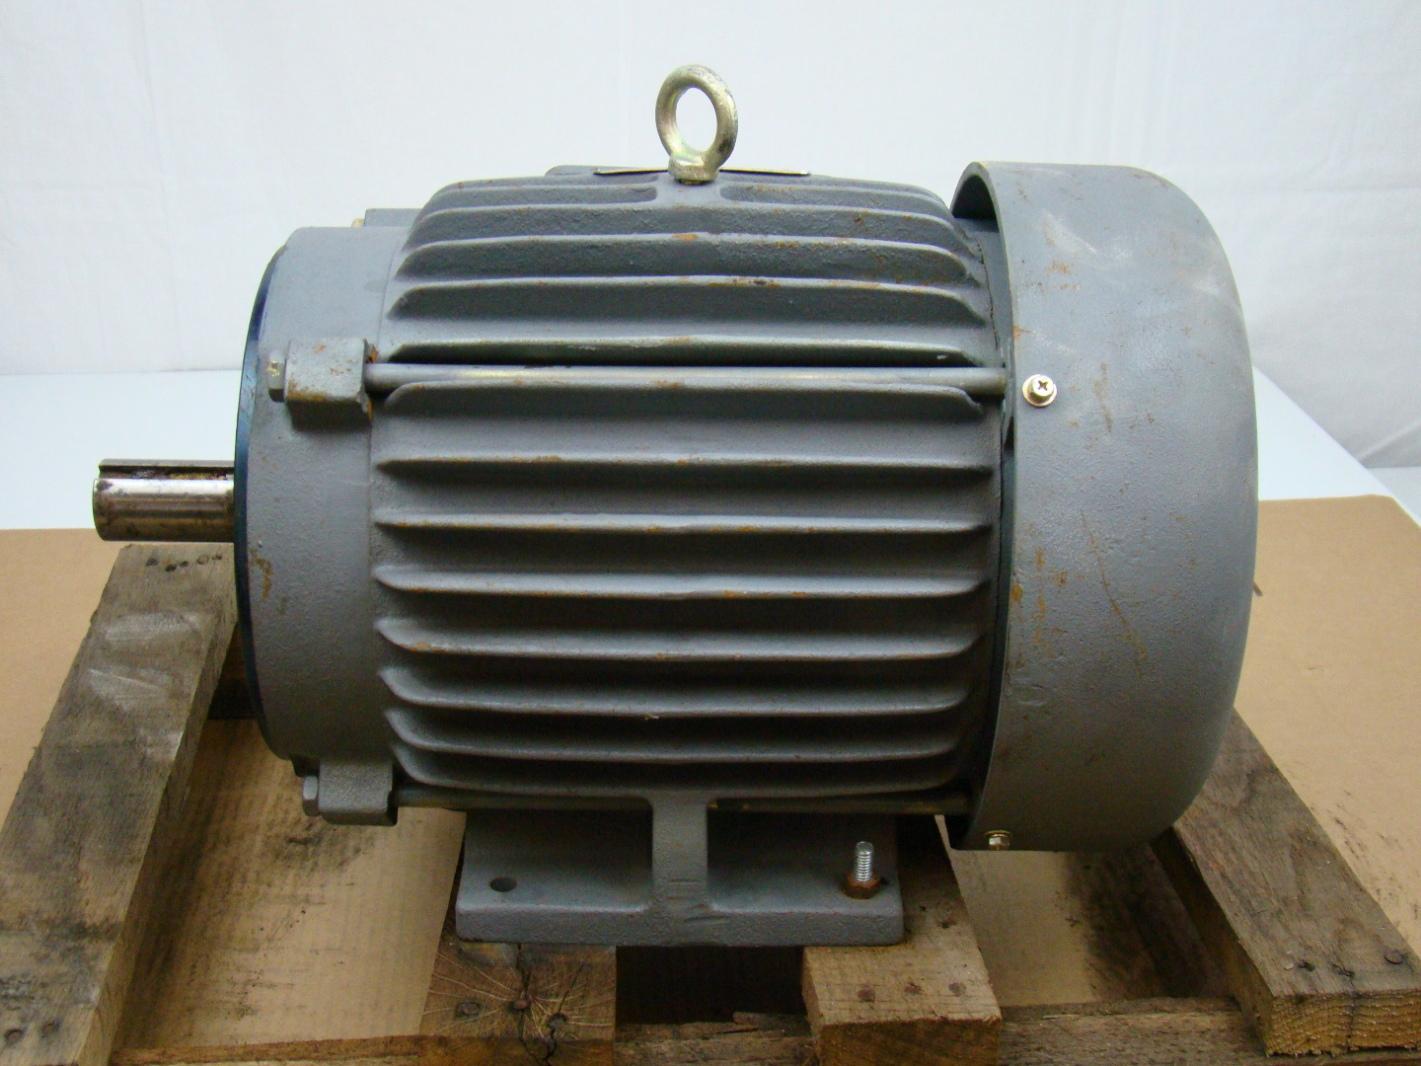 General electric 7 5 hp electric motor 230 460v for Circuit breaker for 7 5 hp motor